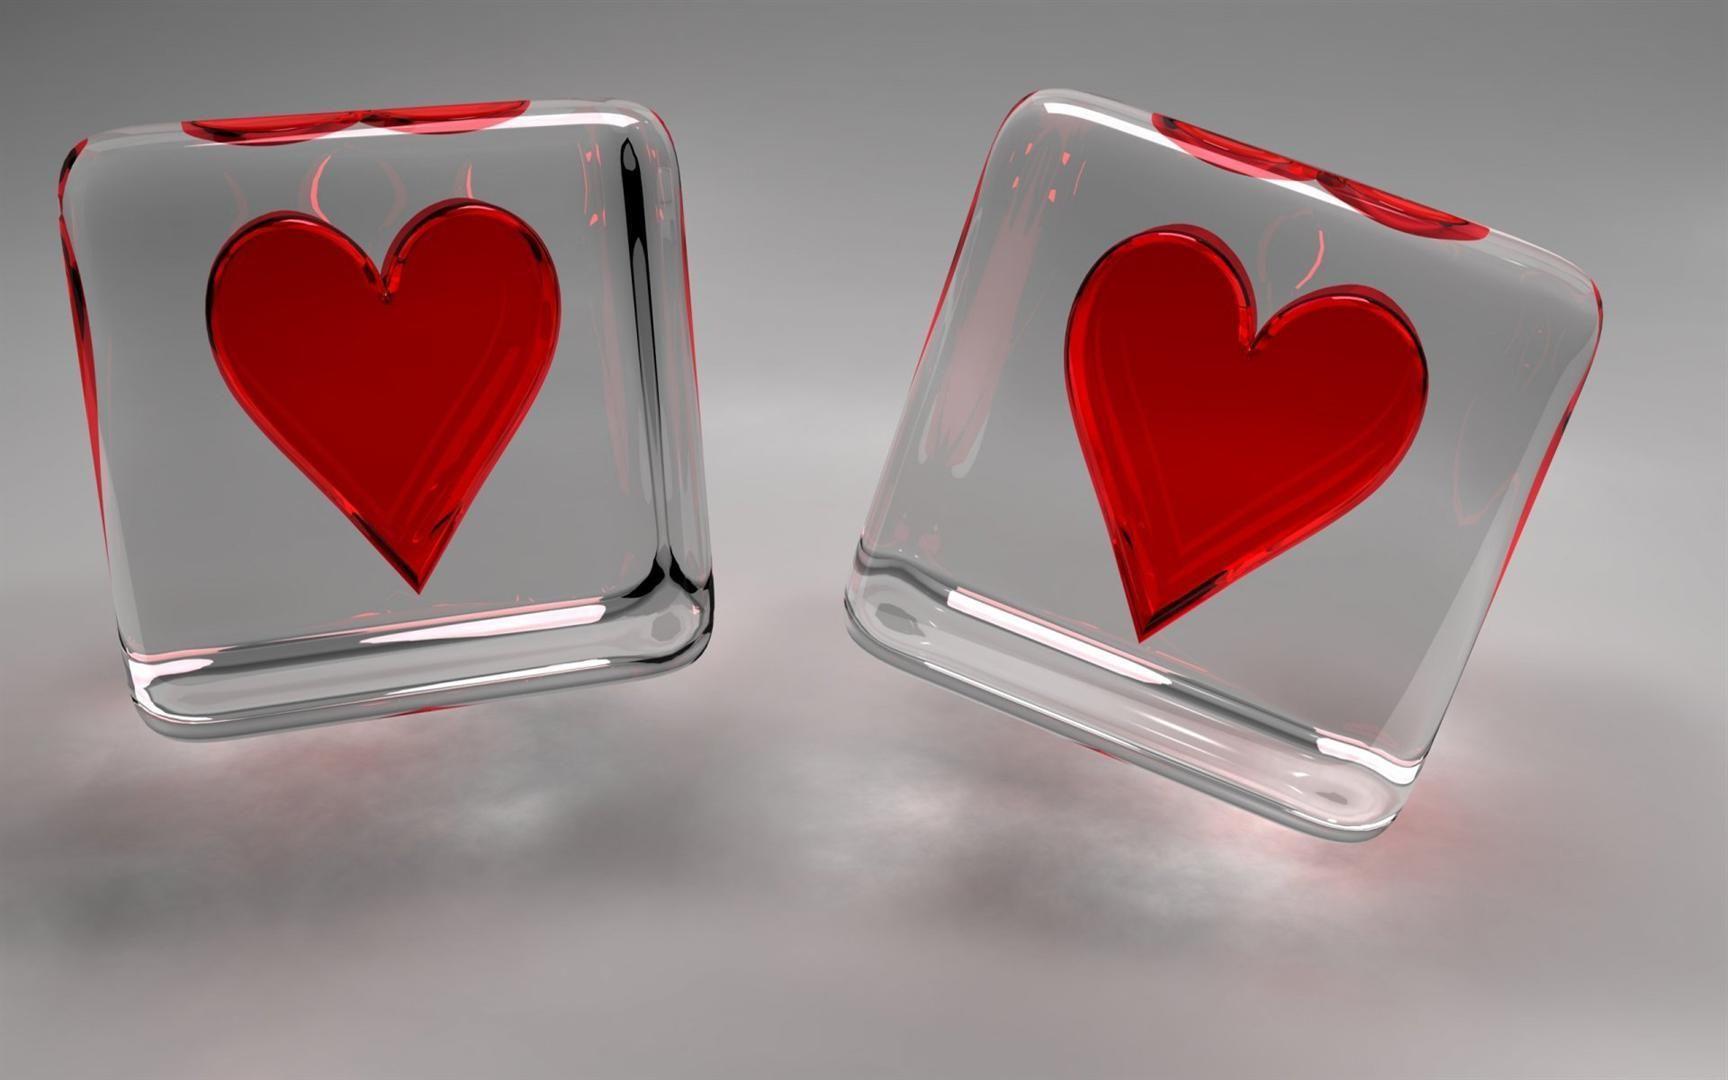 3d Love Hearts Wallpapers Heart Wallpaper Heart Wallpaper Hd